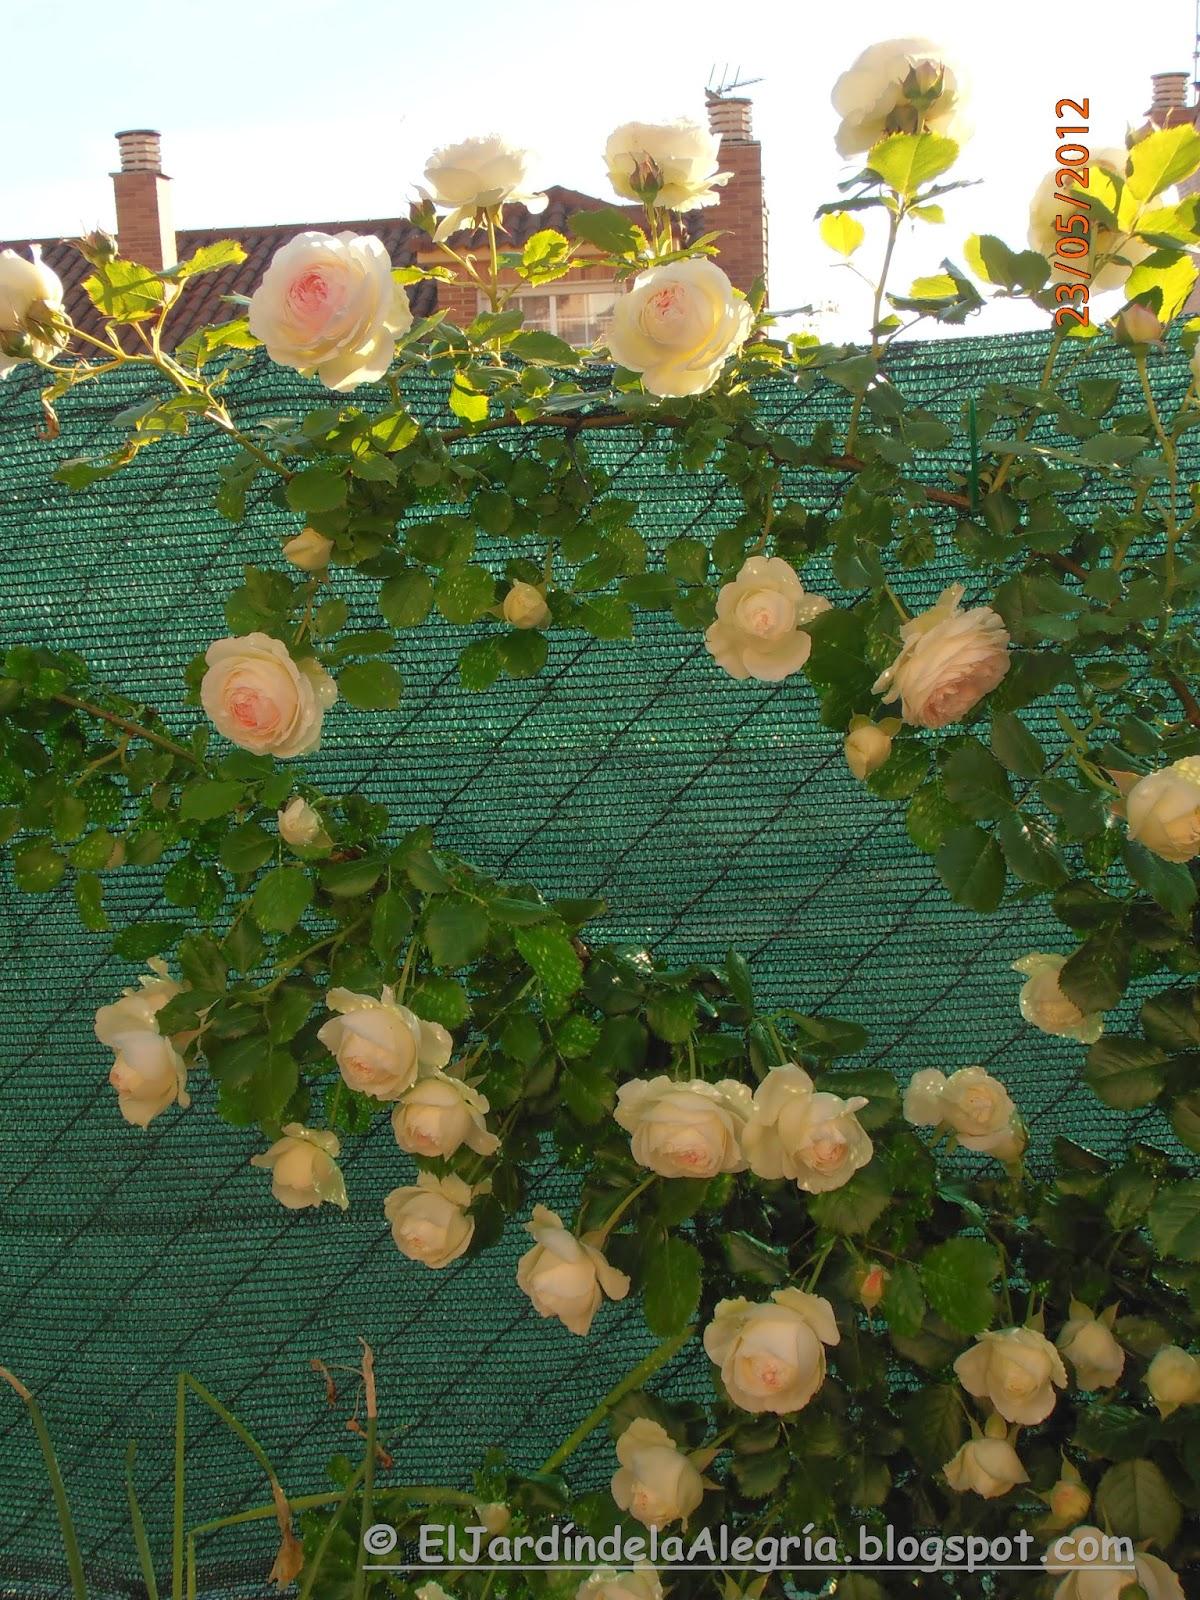 El jard n de la alegr a c mo se podan los rosales for Cancion jardin de rosas